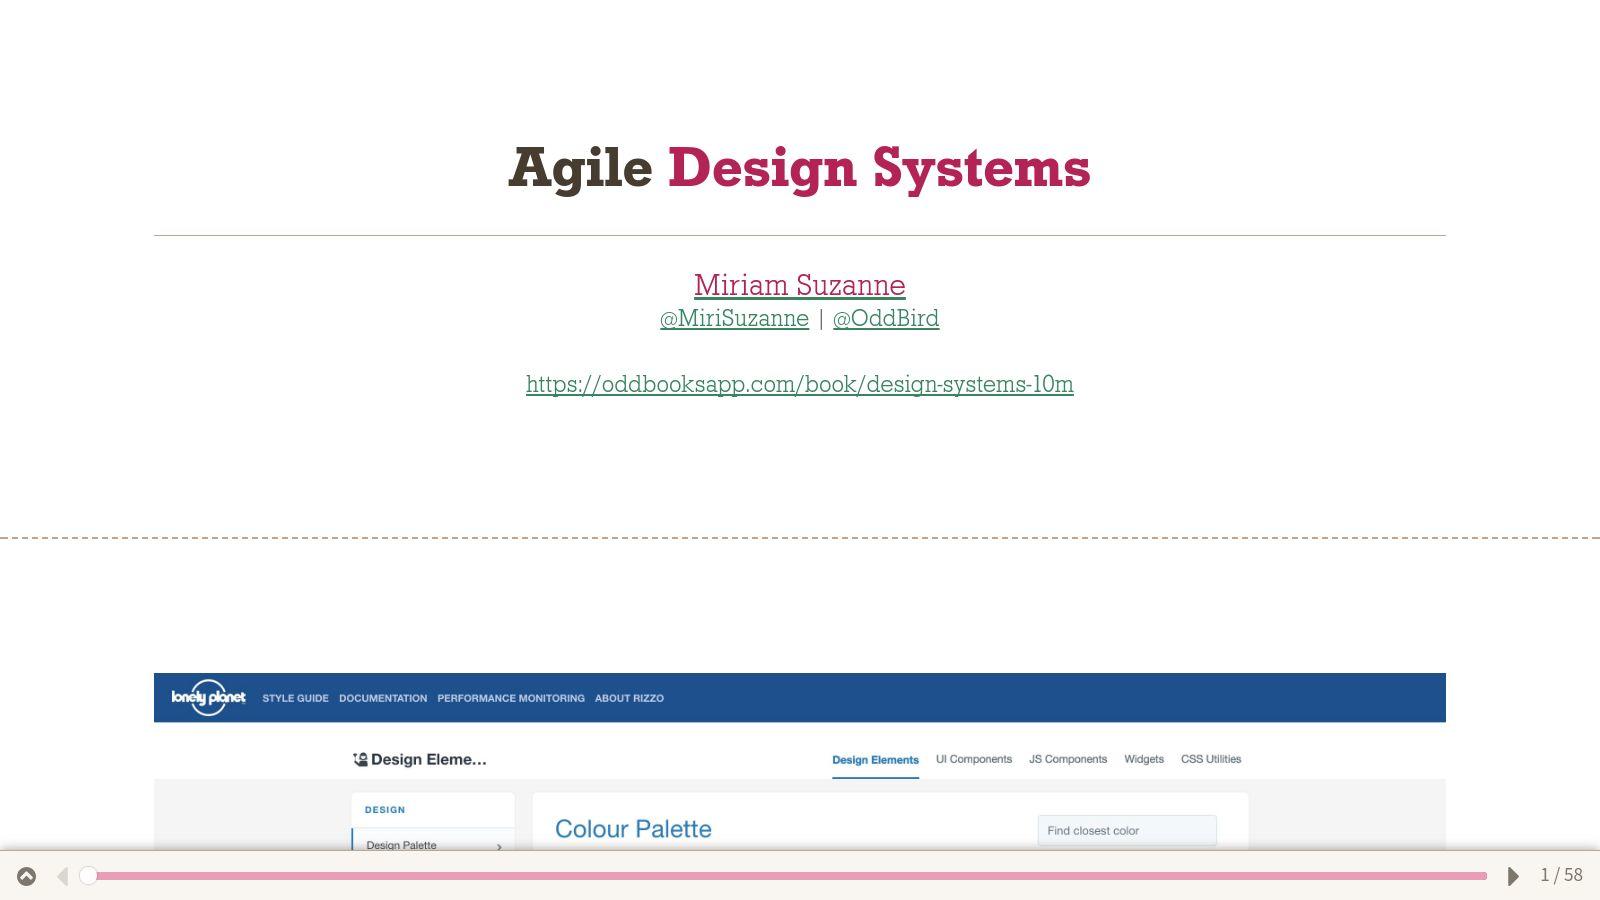 Agile Design Systems